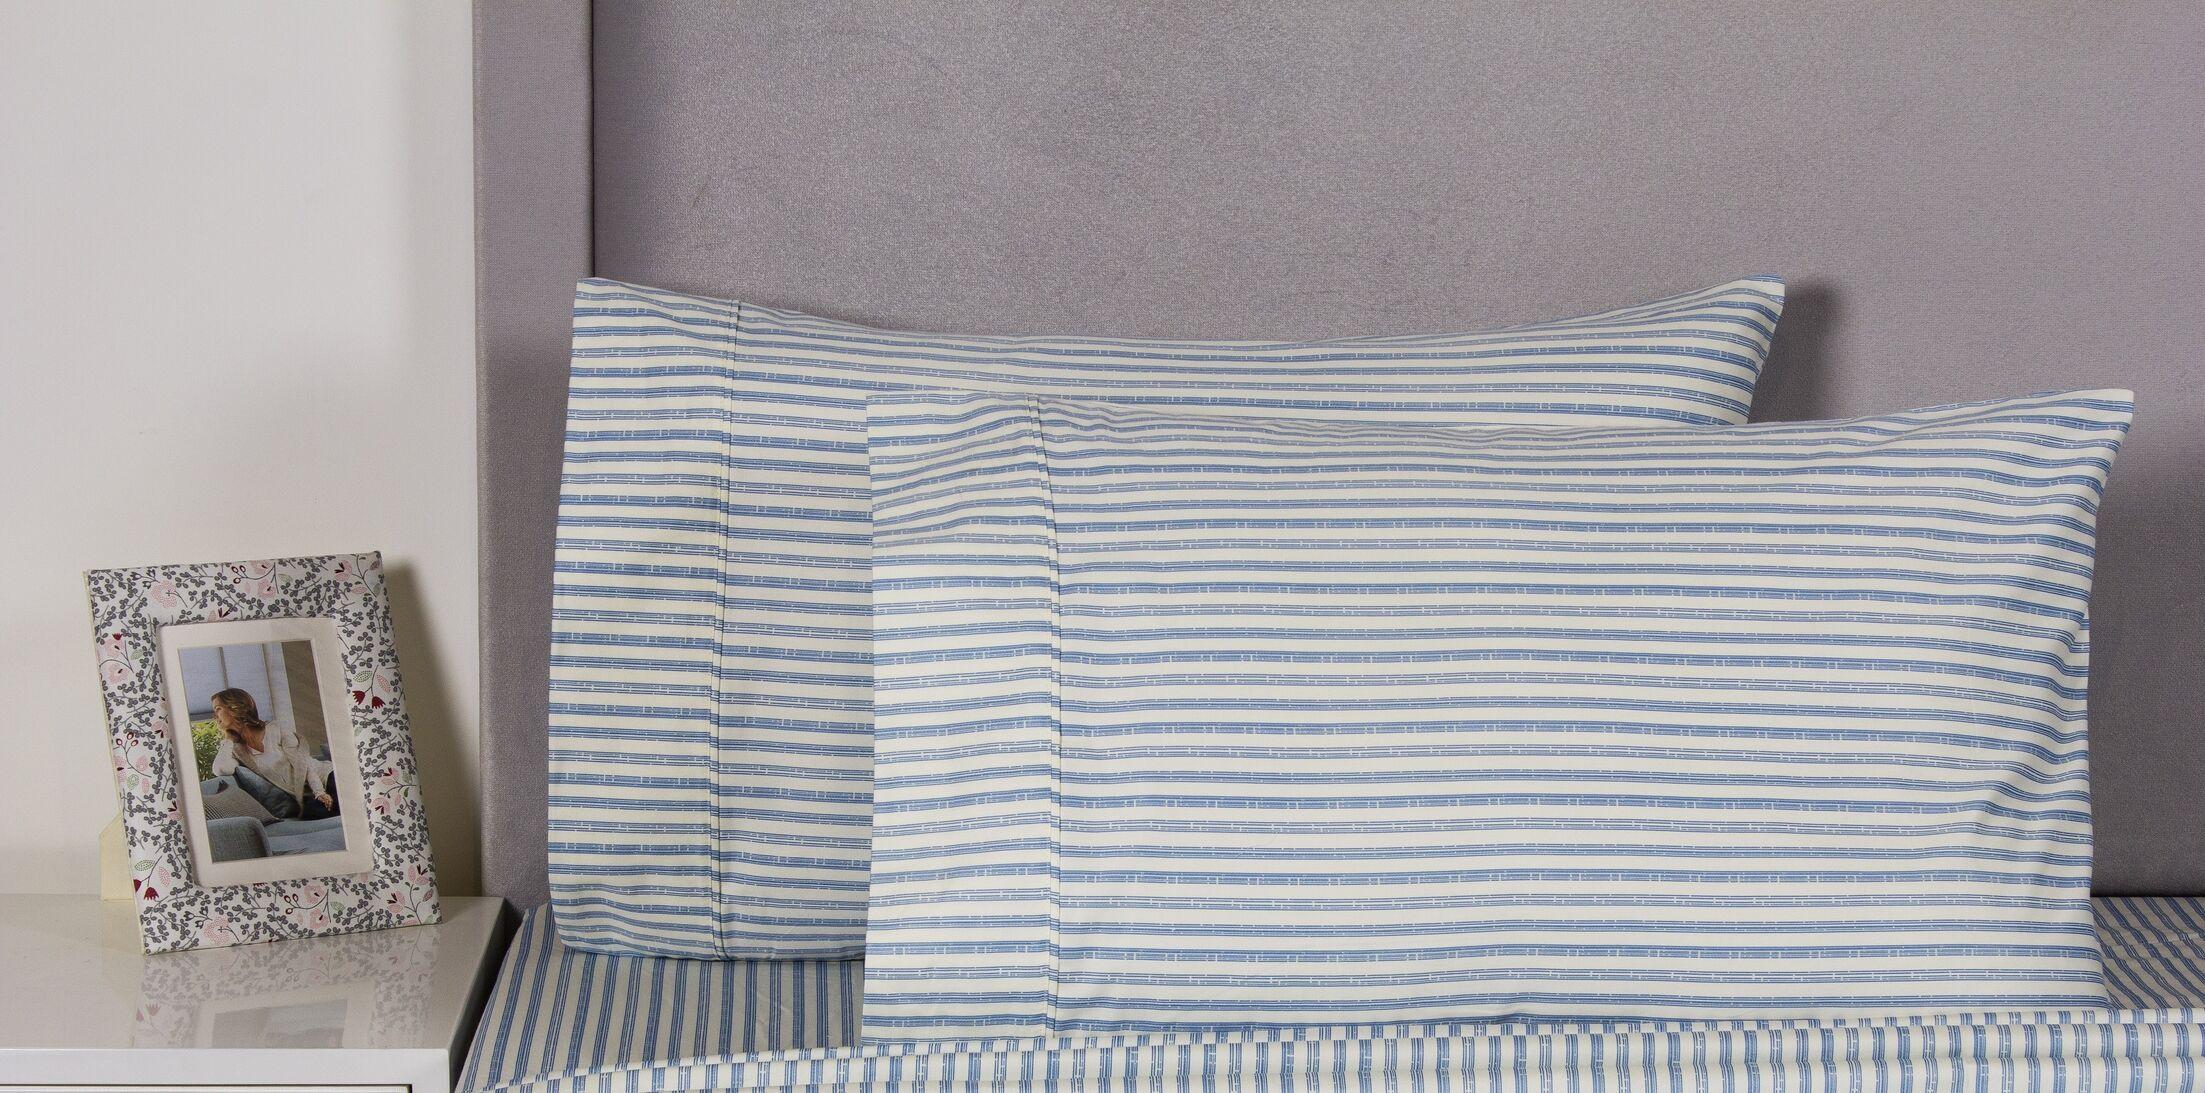 Carlton Stripe Cotton 400 Thread Count Embroidered Pillowcase Color: Navy